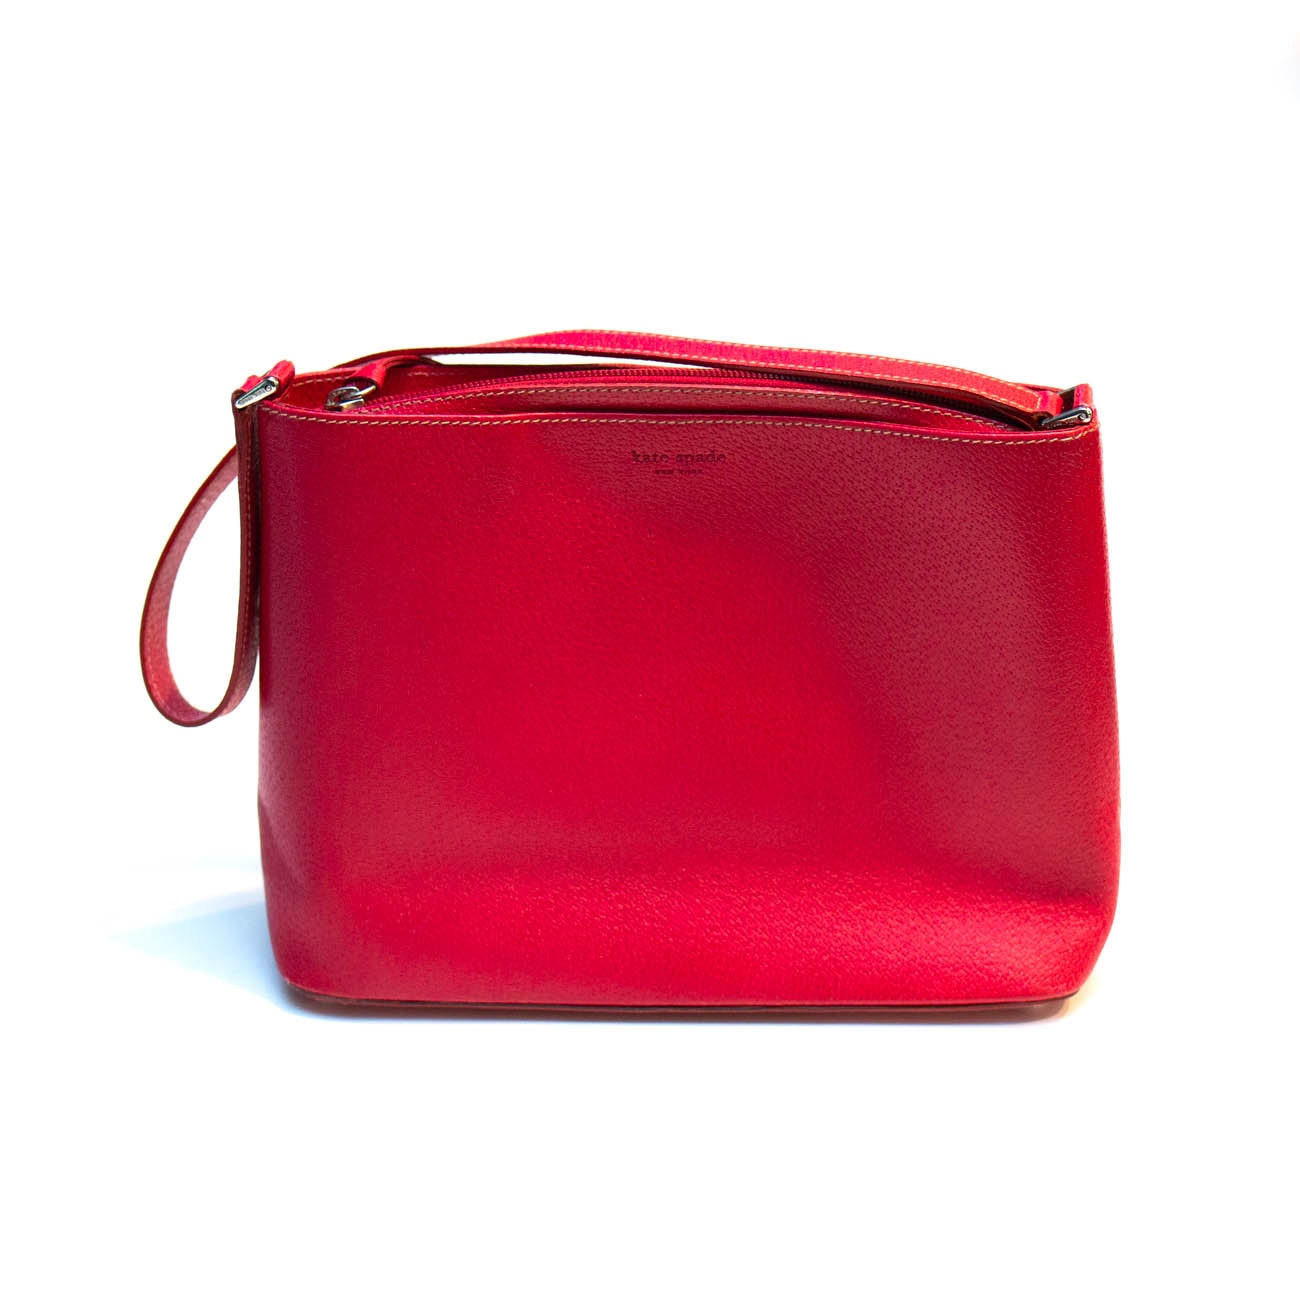 Vintage Kate Spade New York Red Leather Handbag